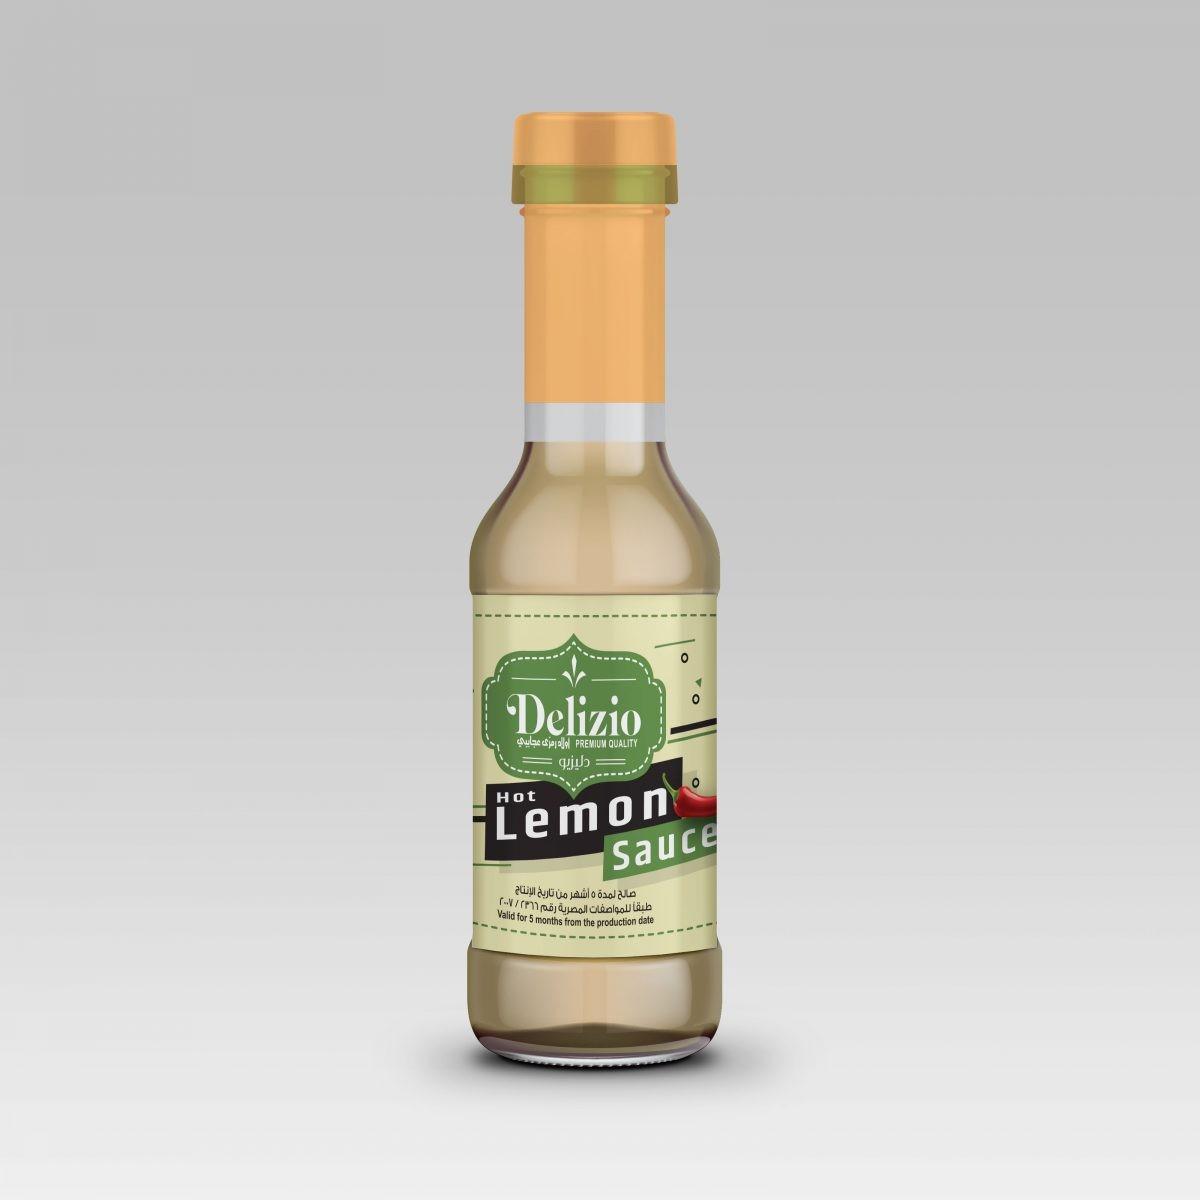 Hot Lemon Sauce